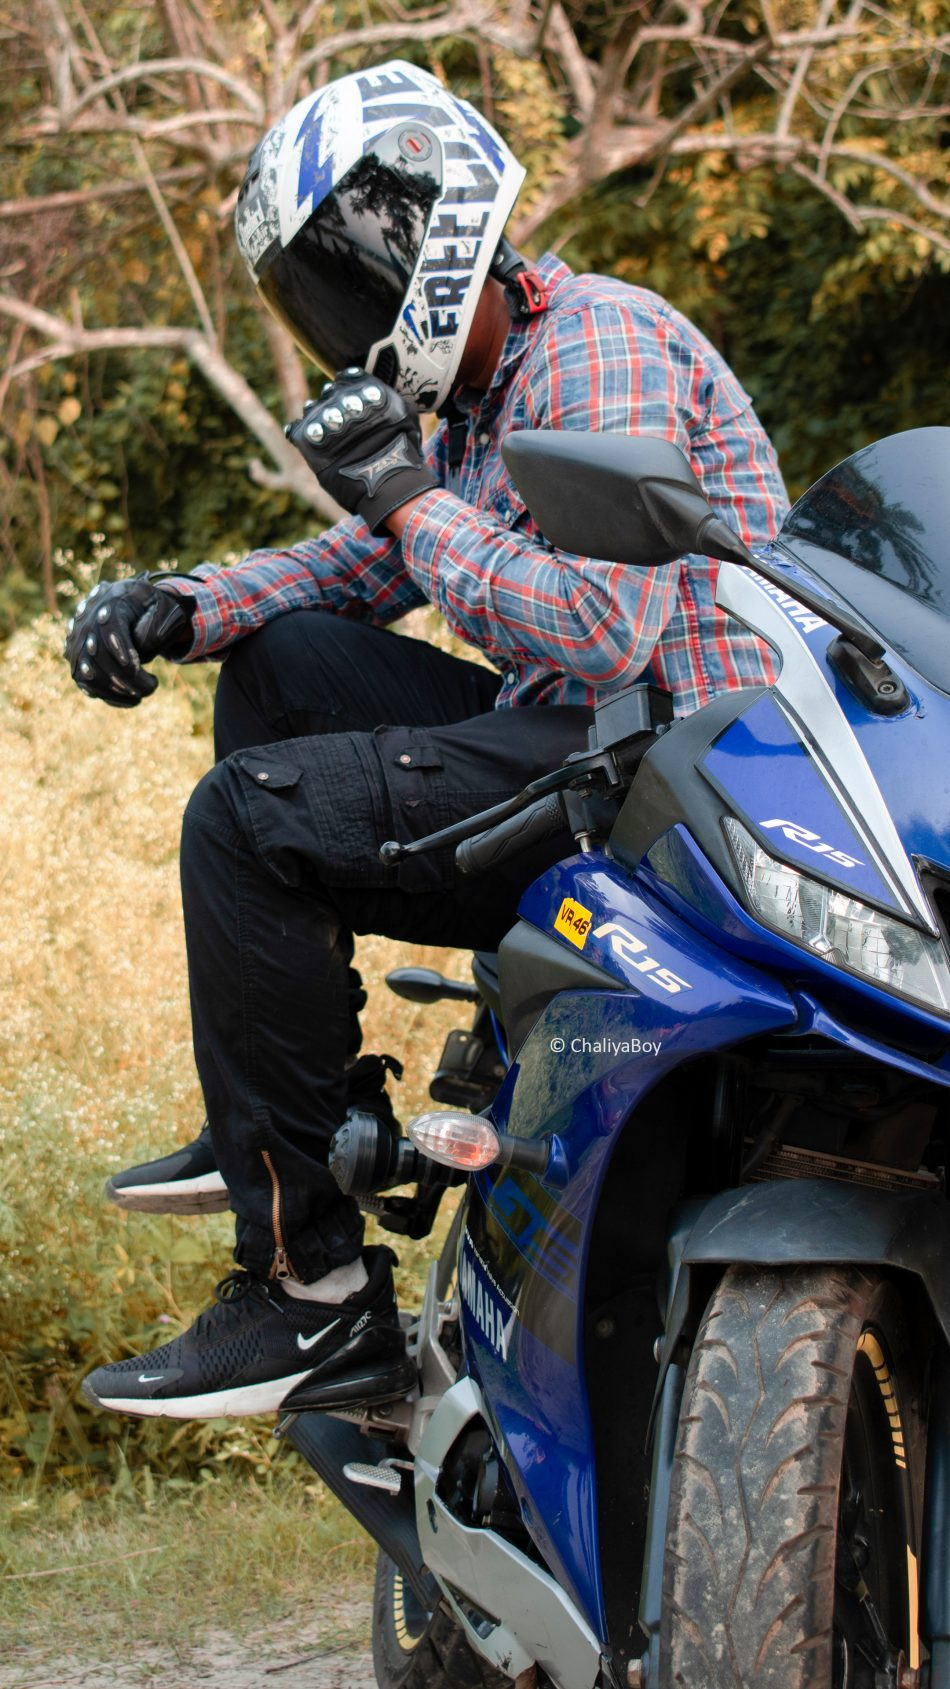 Download Rider Franky R15 Bike Helmet Free Pure 4k Ultra Hd